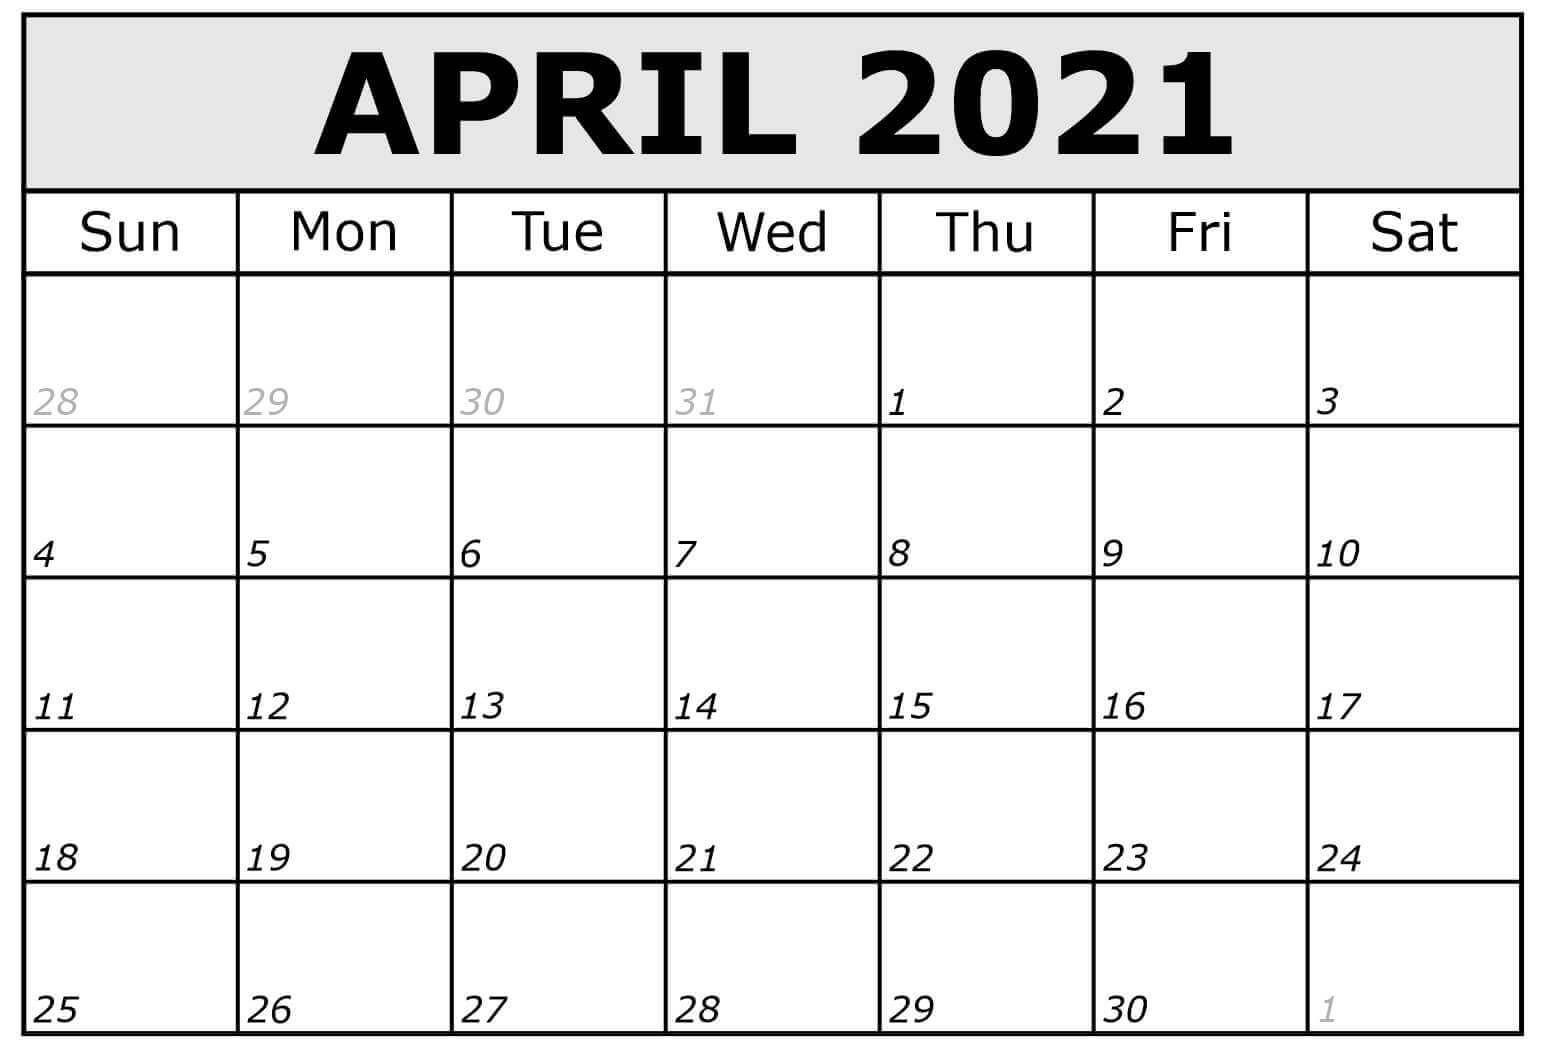 April 2021 Calendar In Pdf Word Excel Printable Template  2021-21 Calendar Template Excel